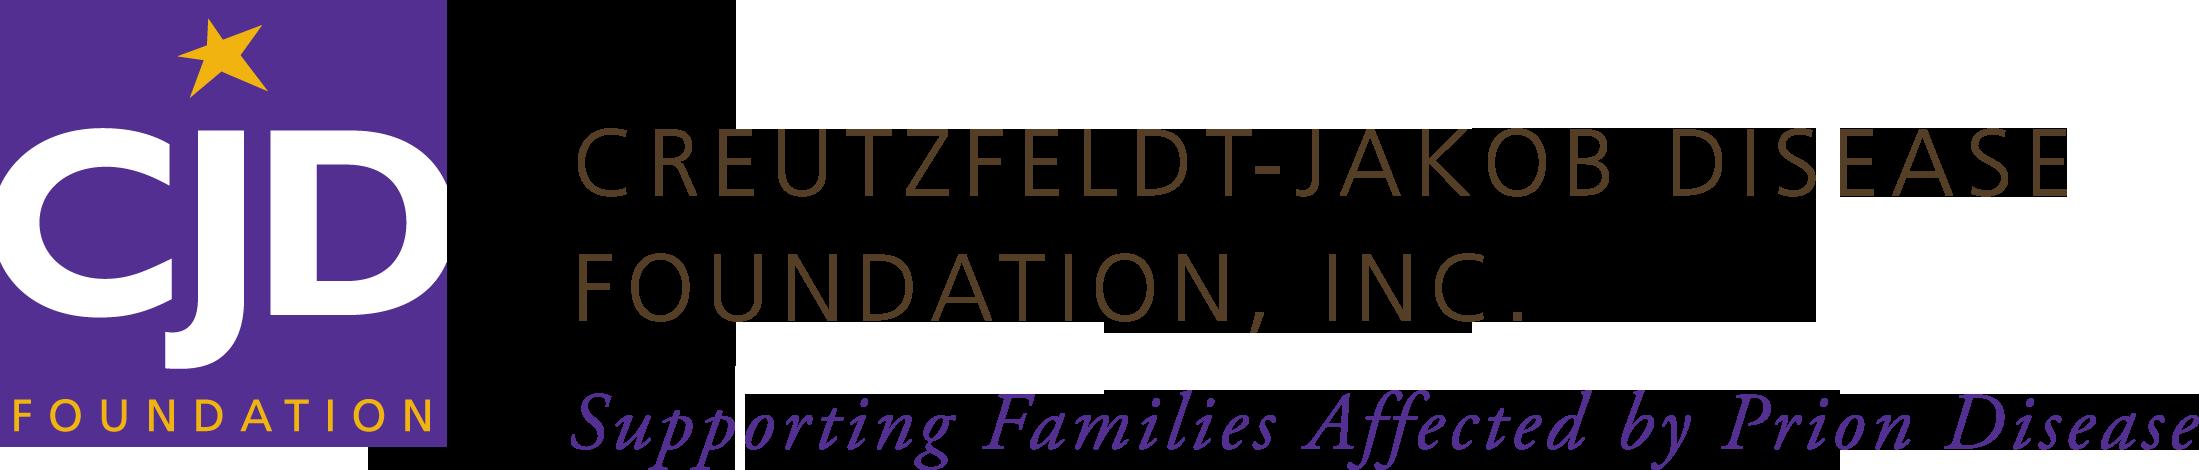 Image for Creutzfeldt-Jakob Disease Foundation